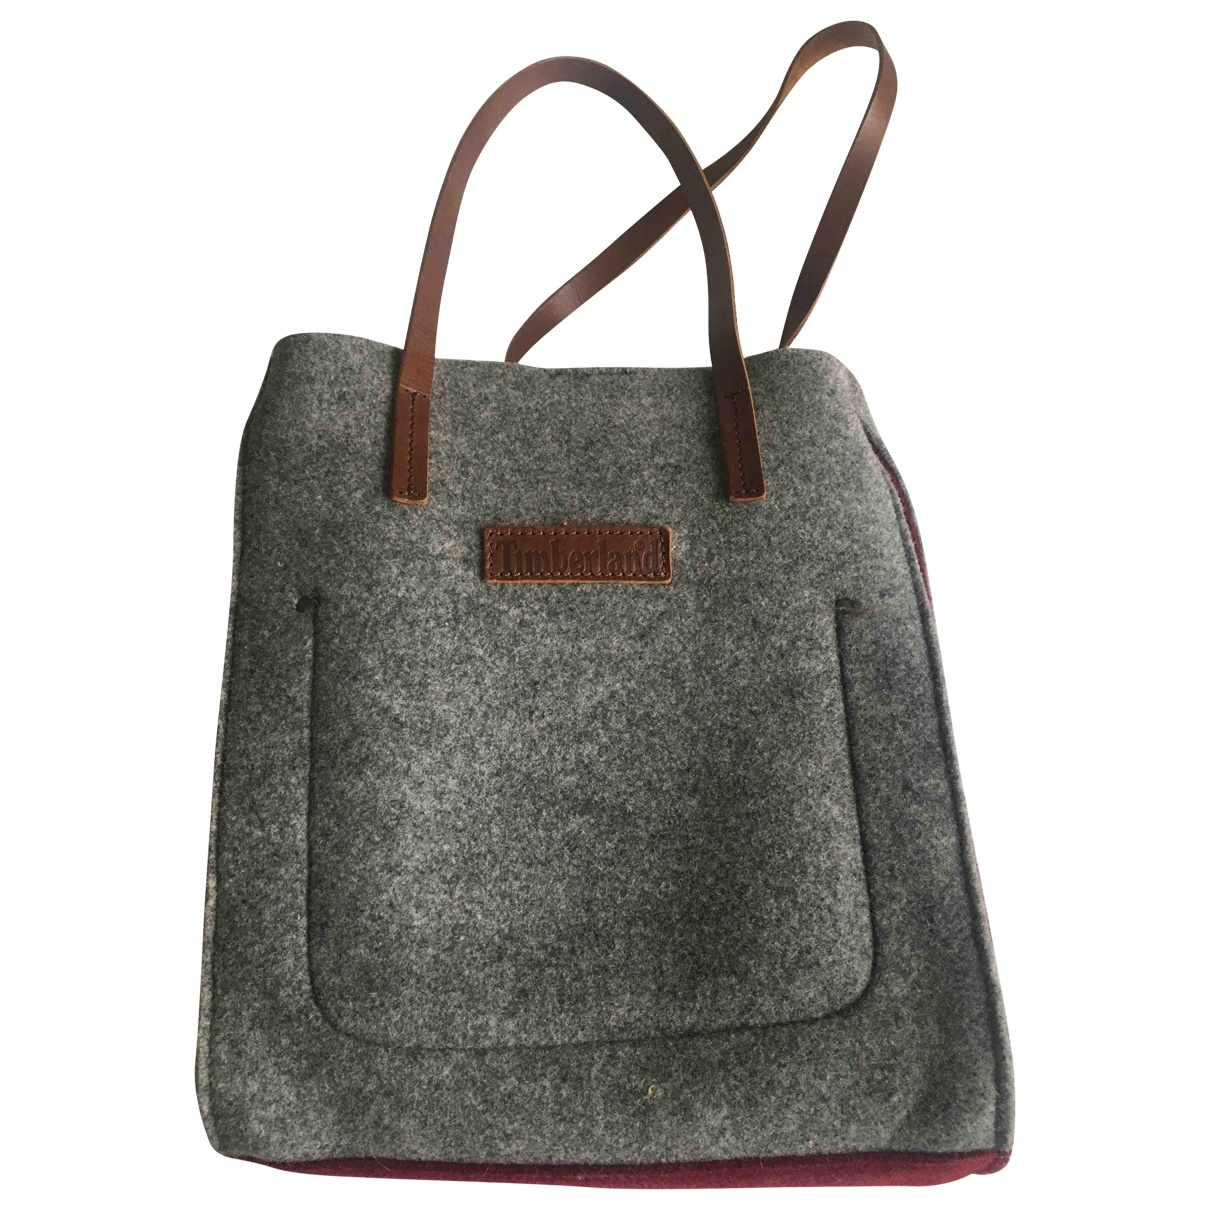 Timberland \N Grey Wool handbag for Women \N